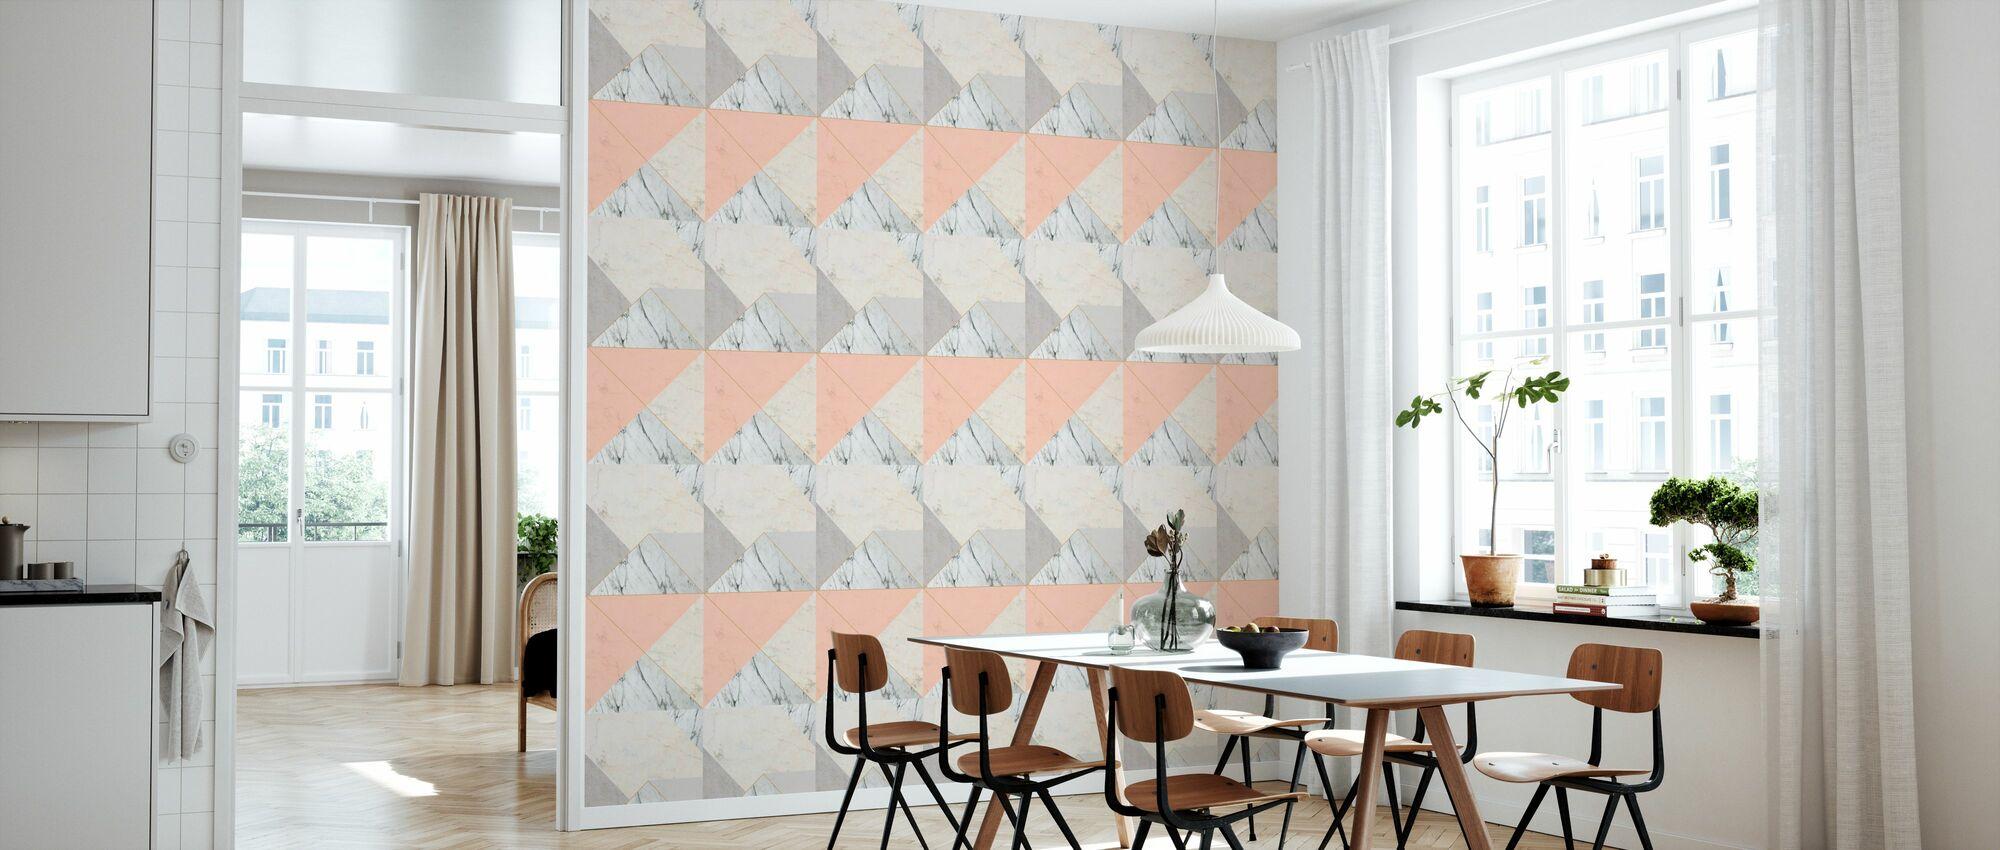 Marble 2.0 Apricot - Wallpaper - Kitchen